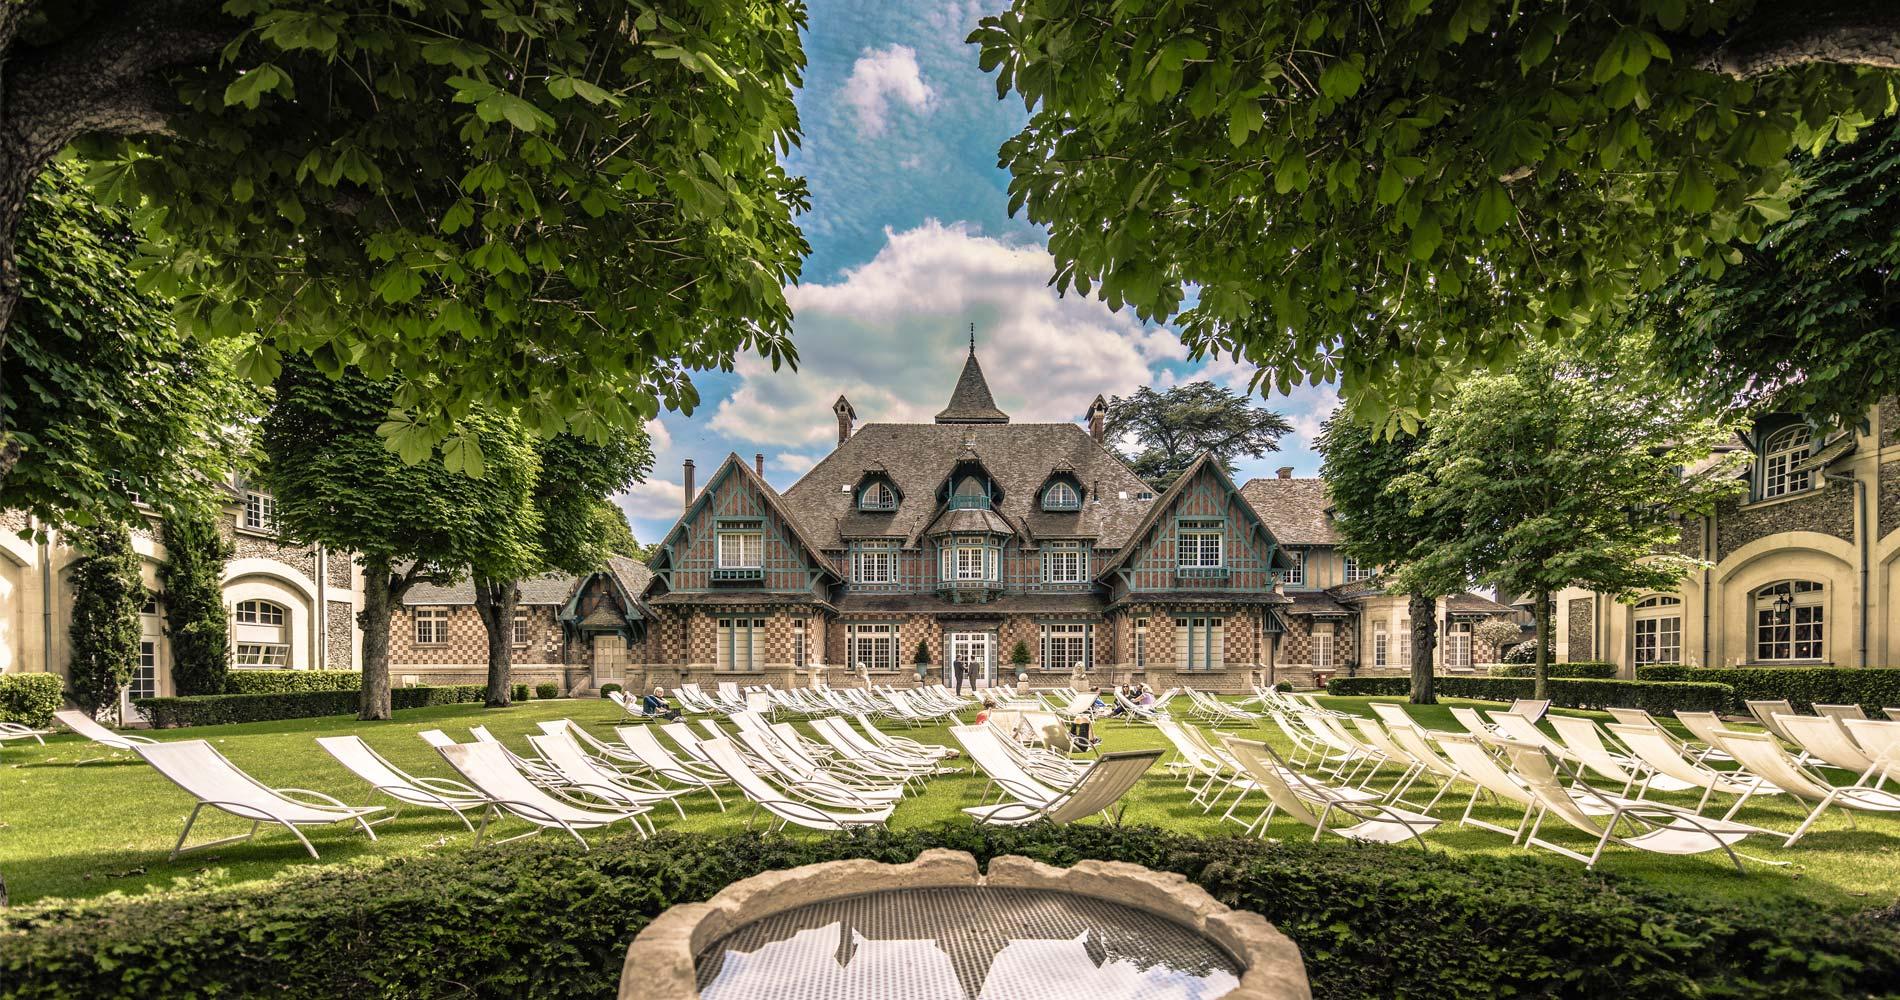 Hotel Saint Cloud